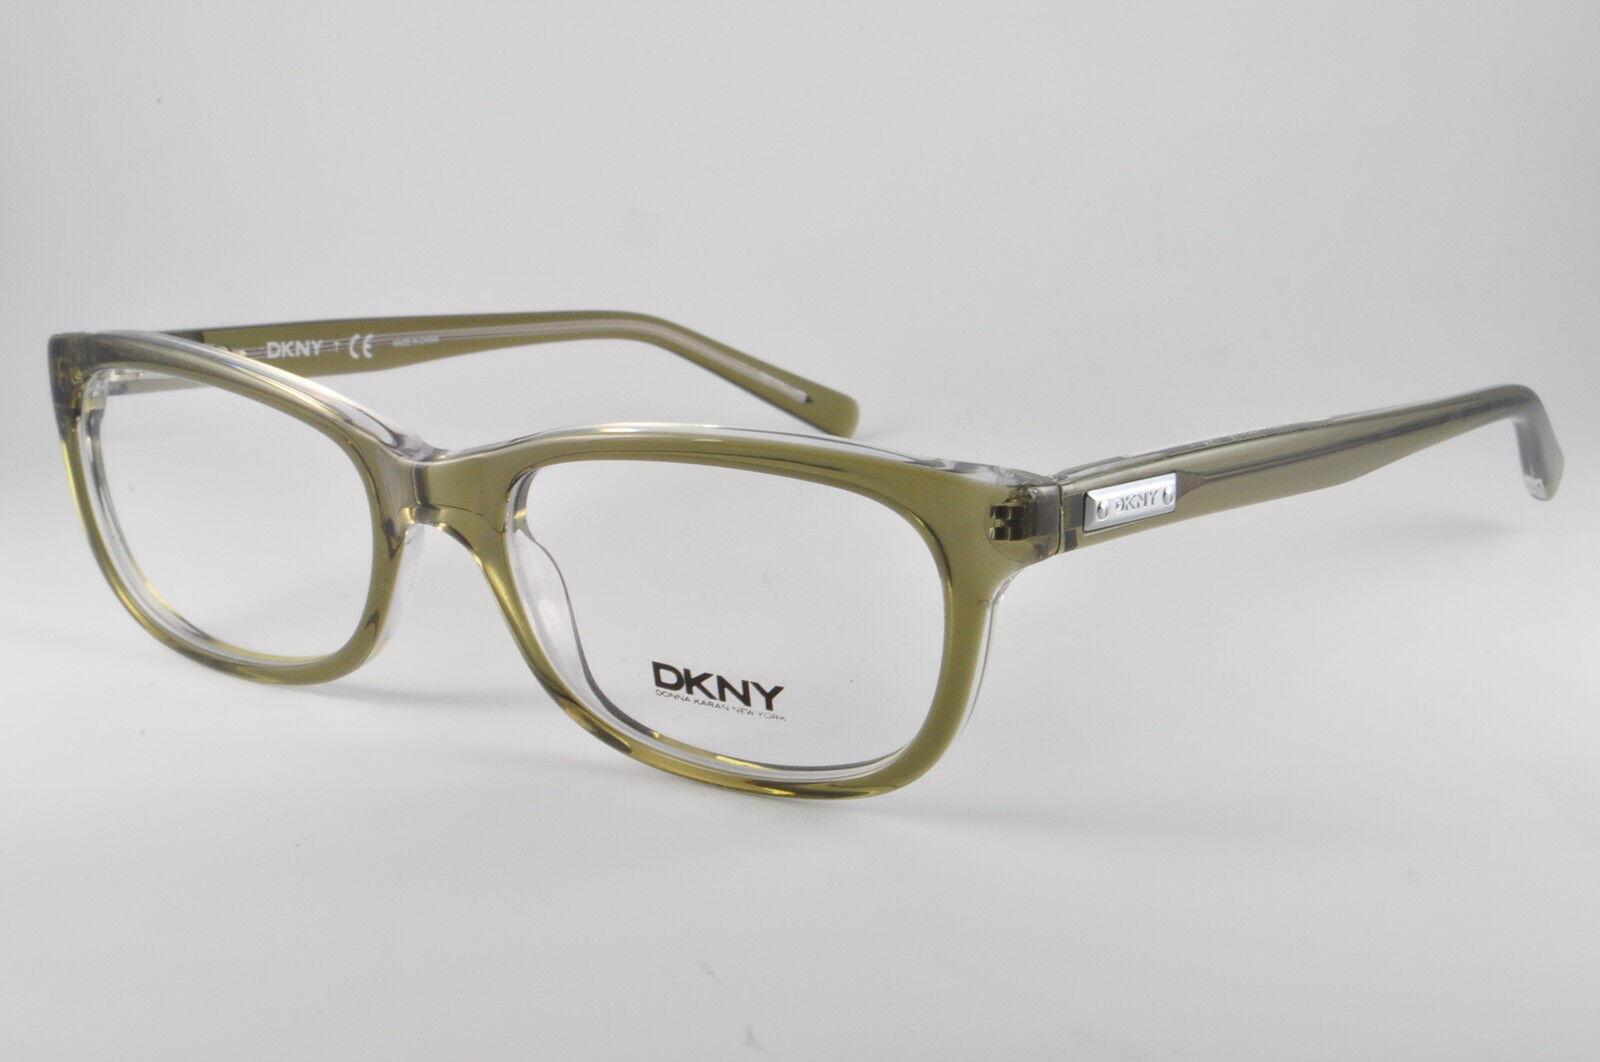 116ff86b0a DKNY Eyeglasses DY 4635 3597 Olive Transparent